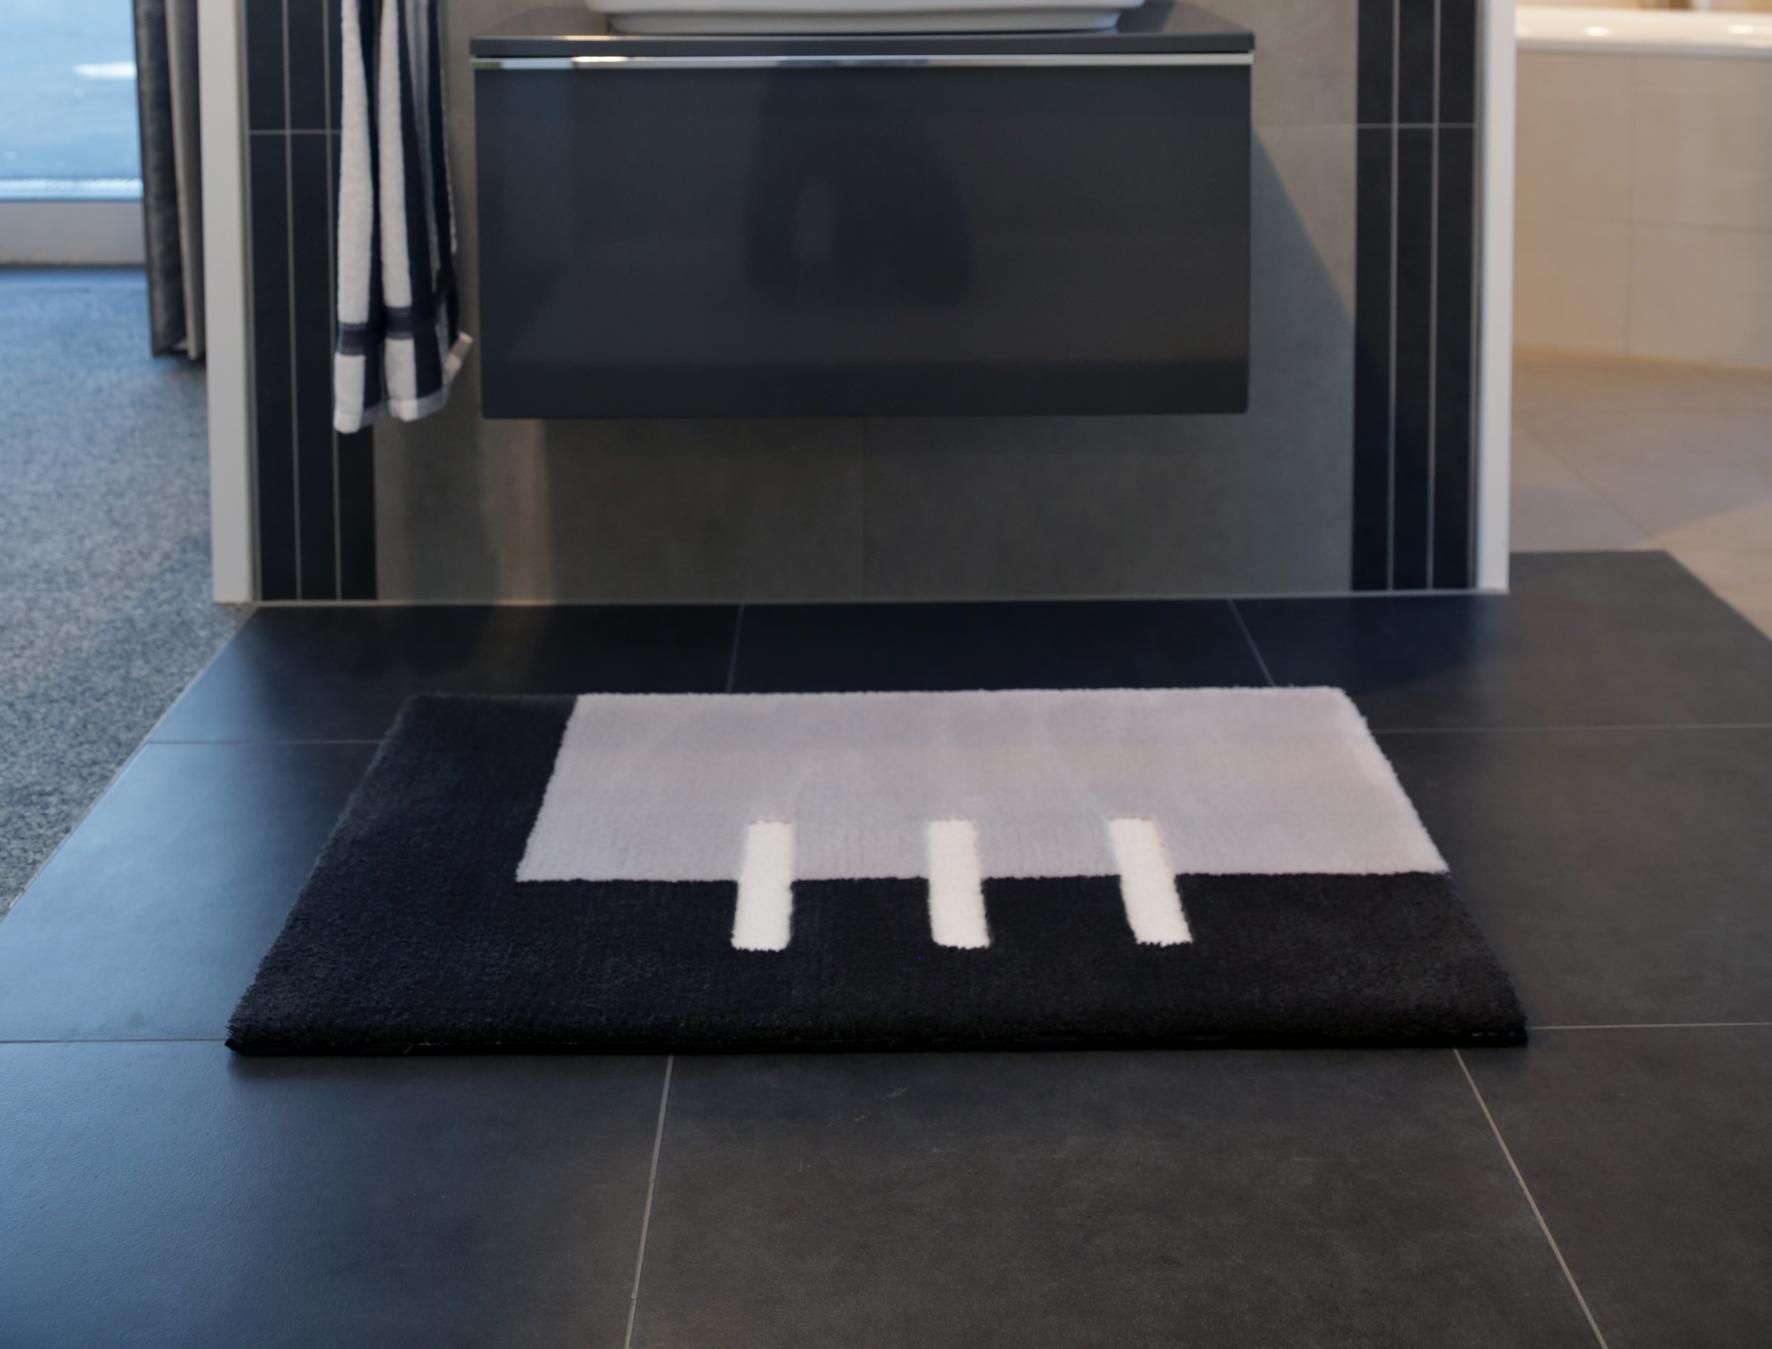 neues badteppich design badteppich imola wohn badteppiche nach ma. Black Bedroom Furniture Sets. Home Design Ideas